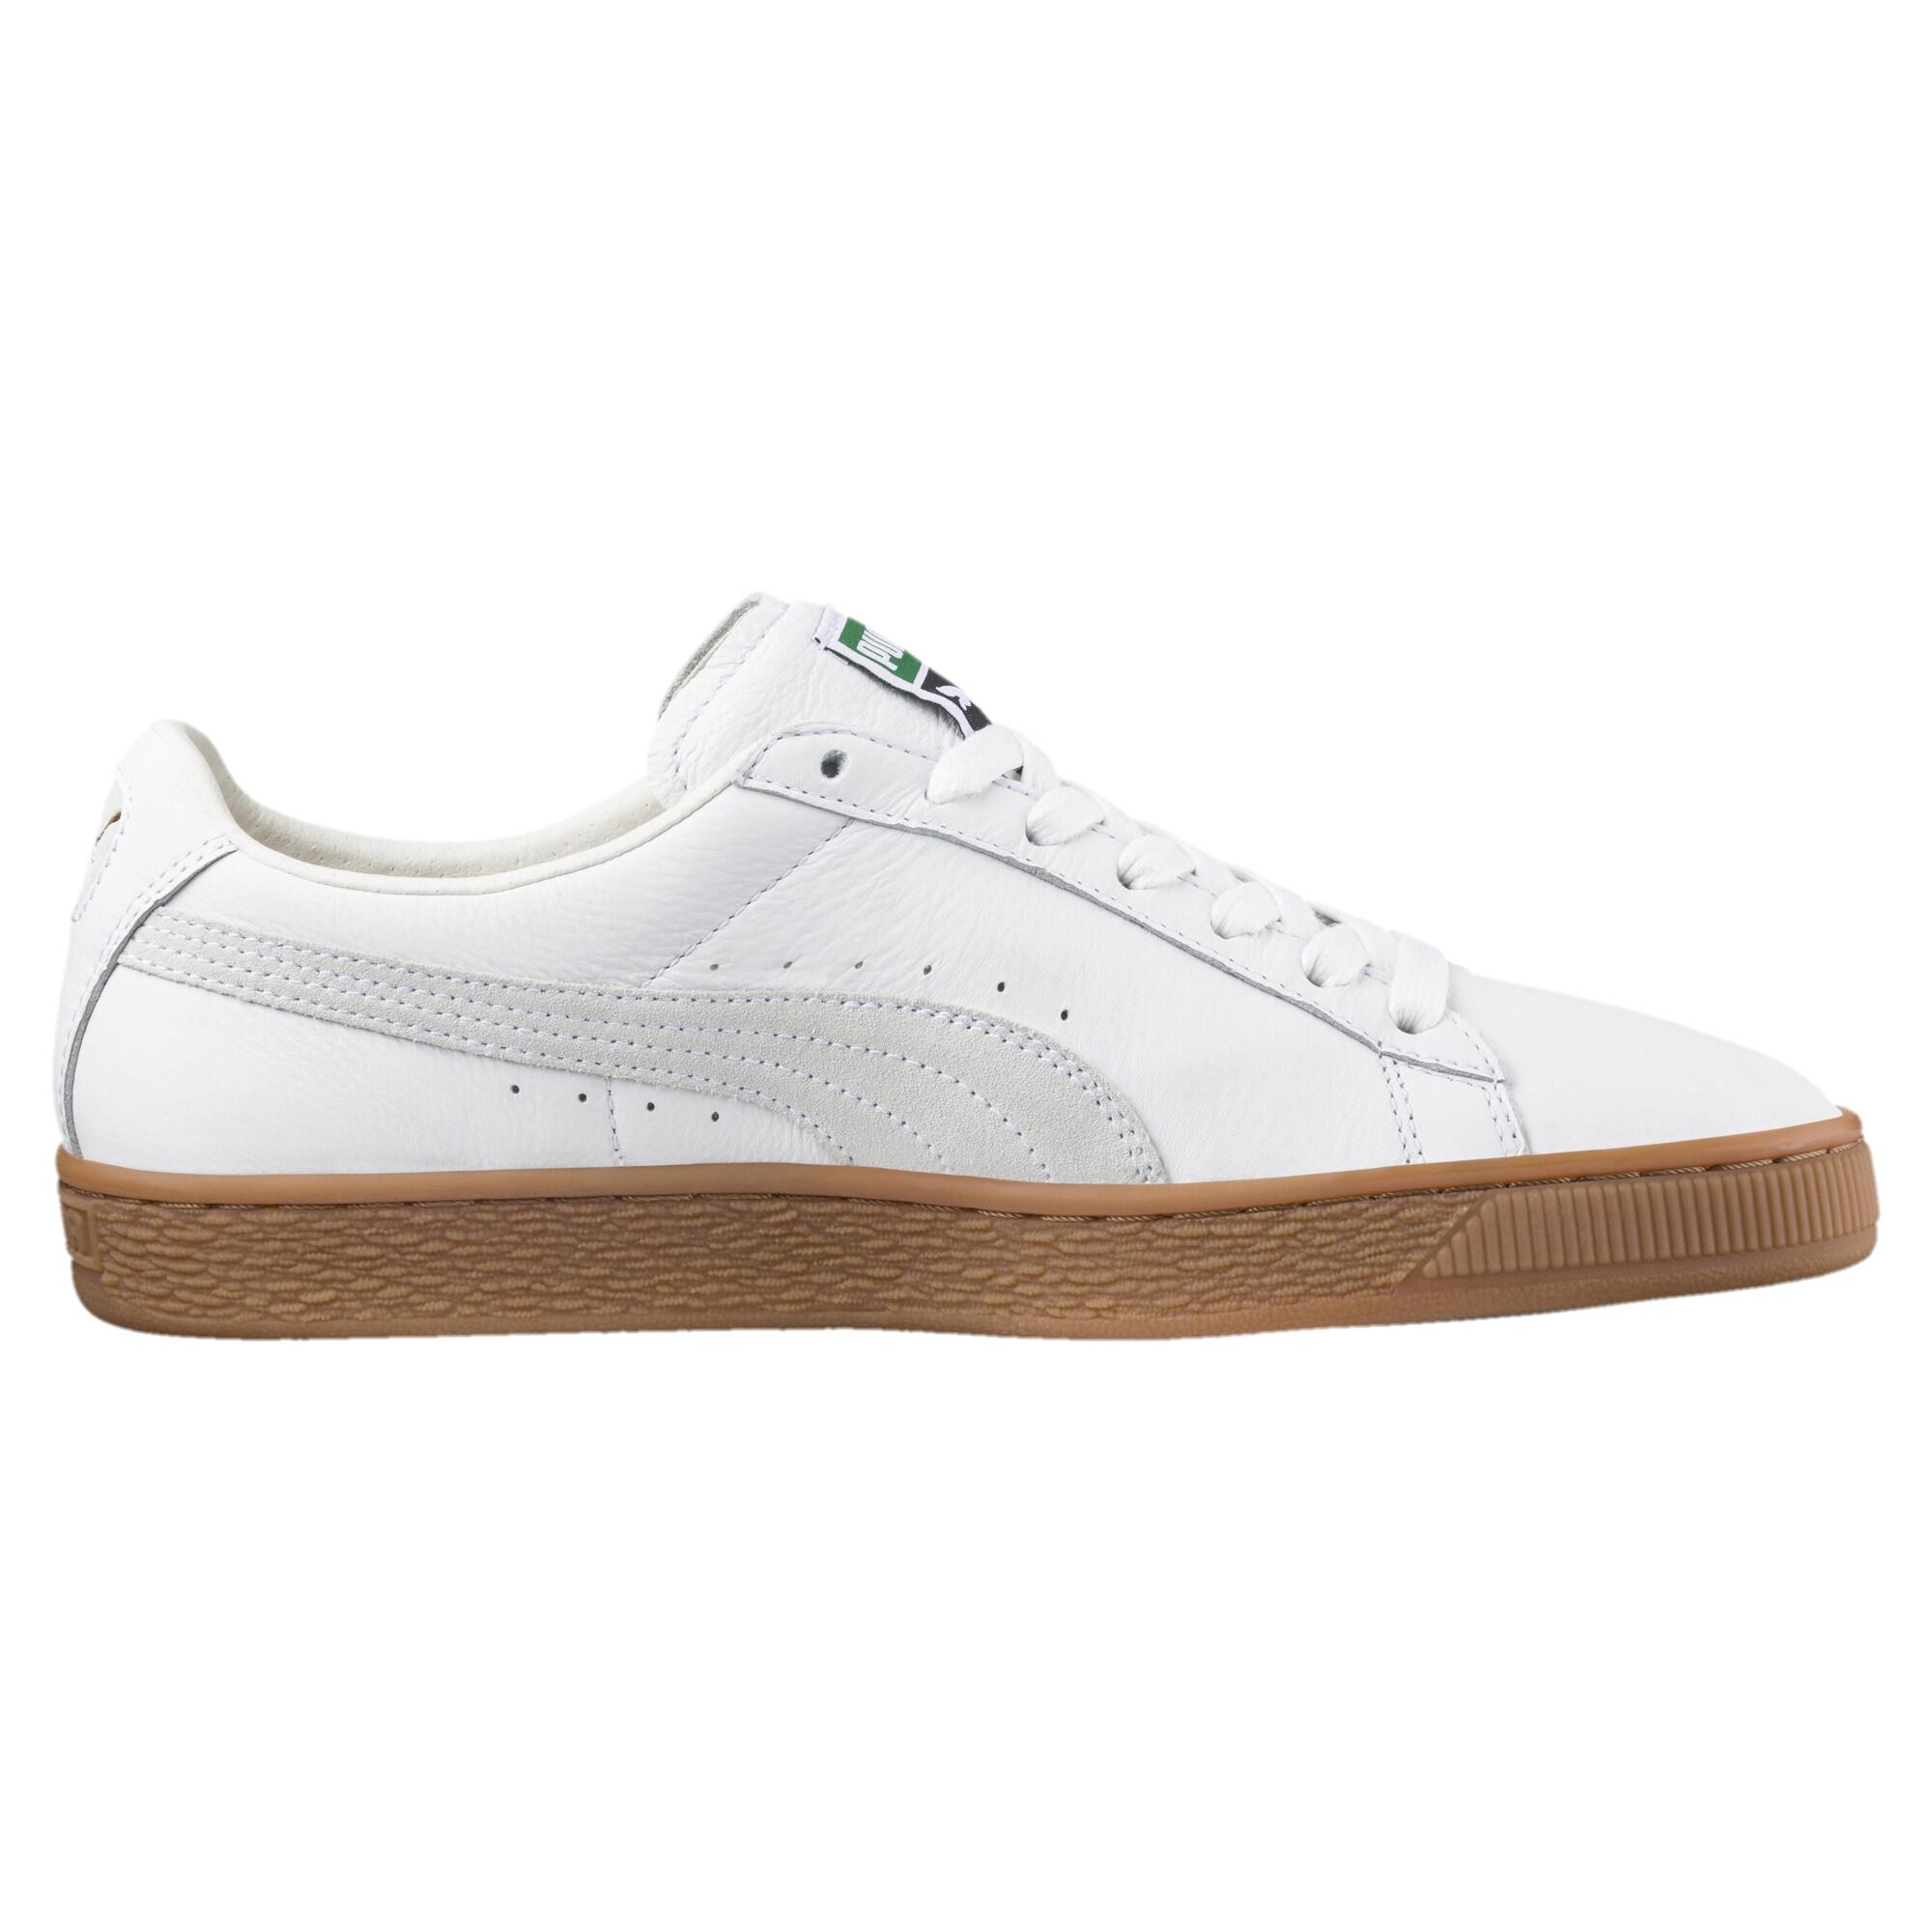 Image Puma Men's Basket Classic Gum Deluxe Sneakers #3